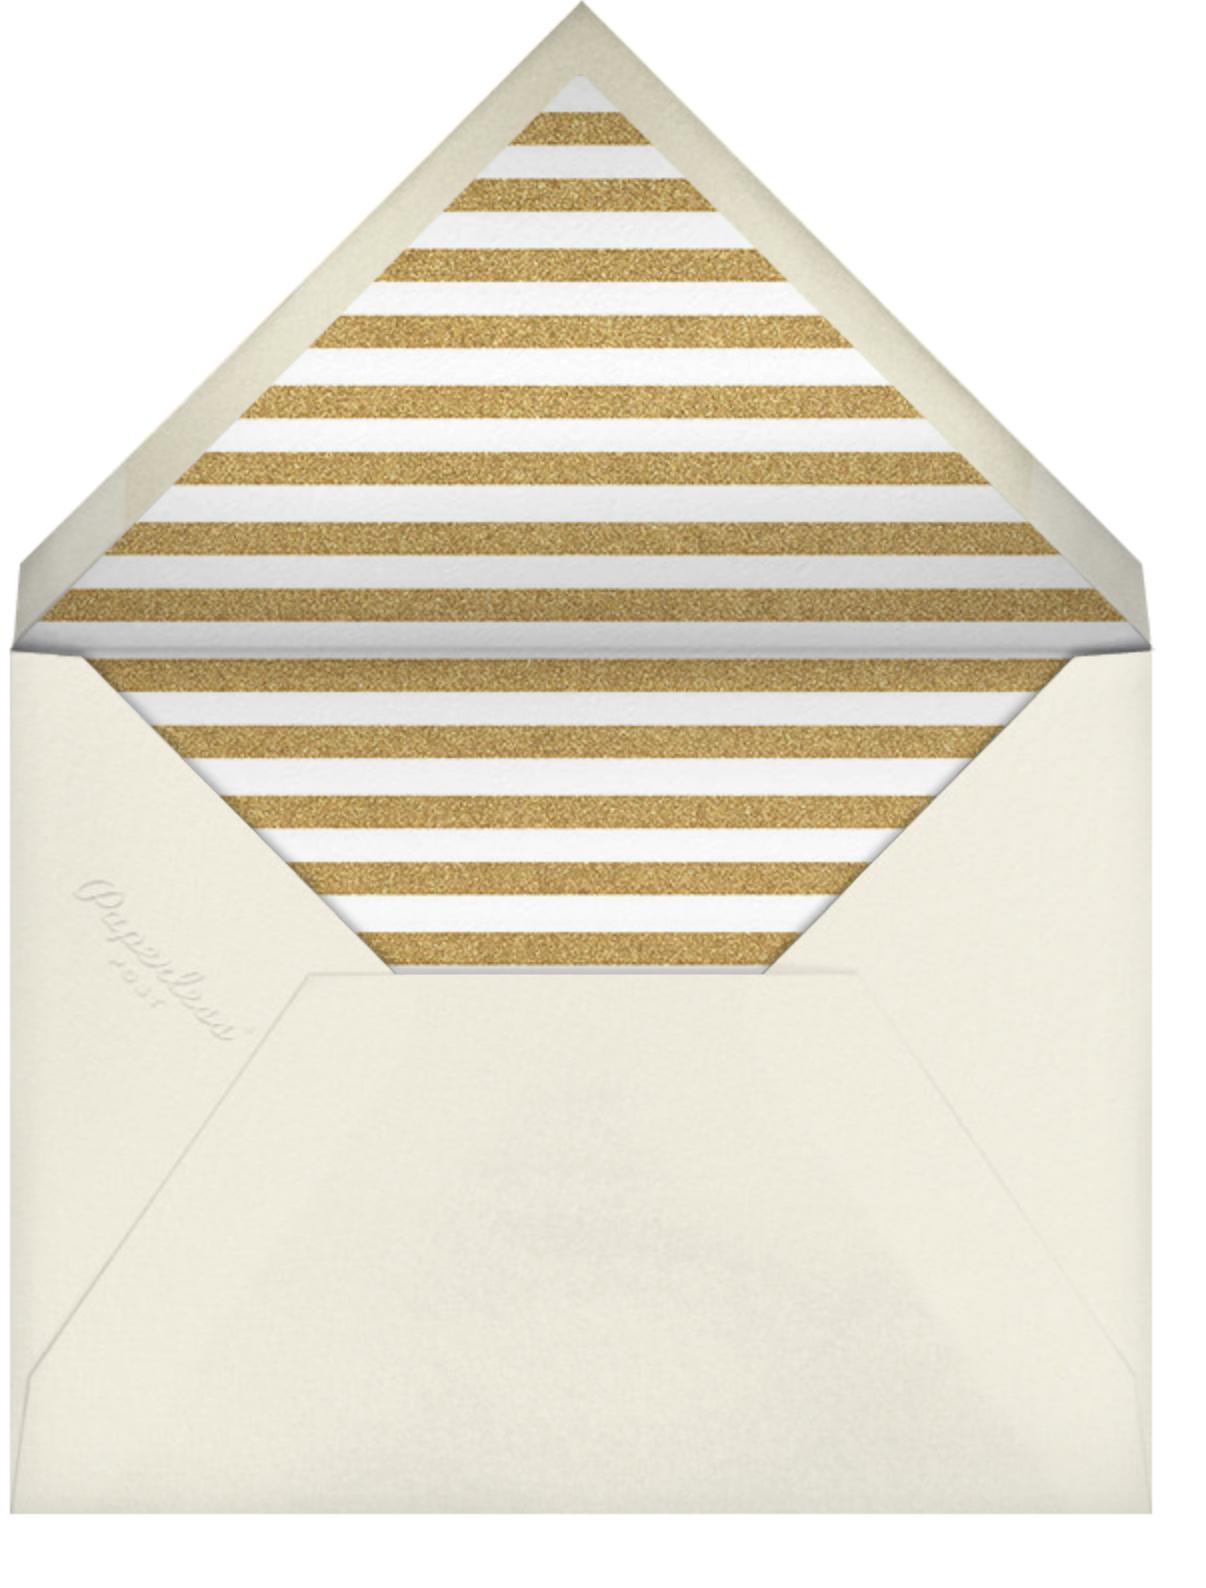 It's Your Day - The Indigo Bunting - Birthday - envelope back